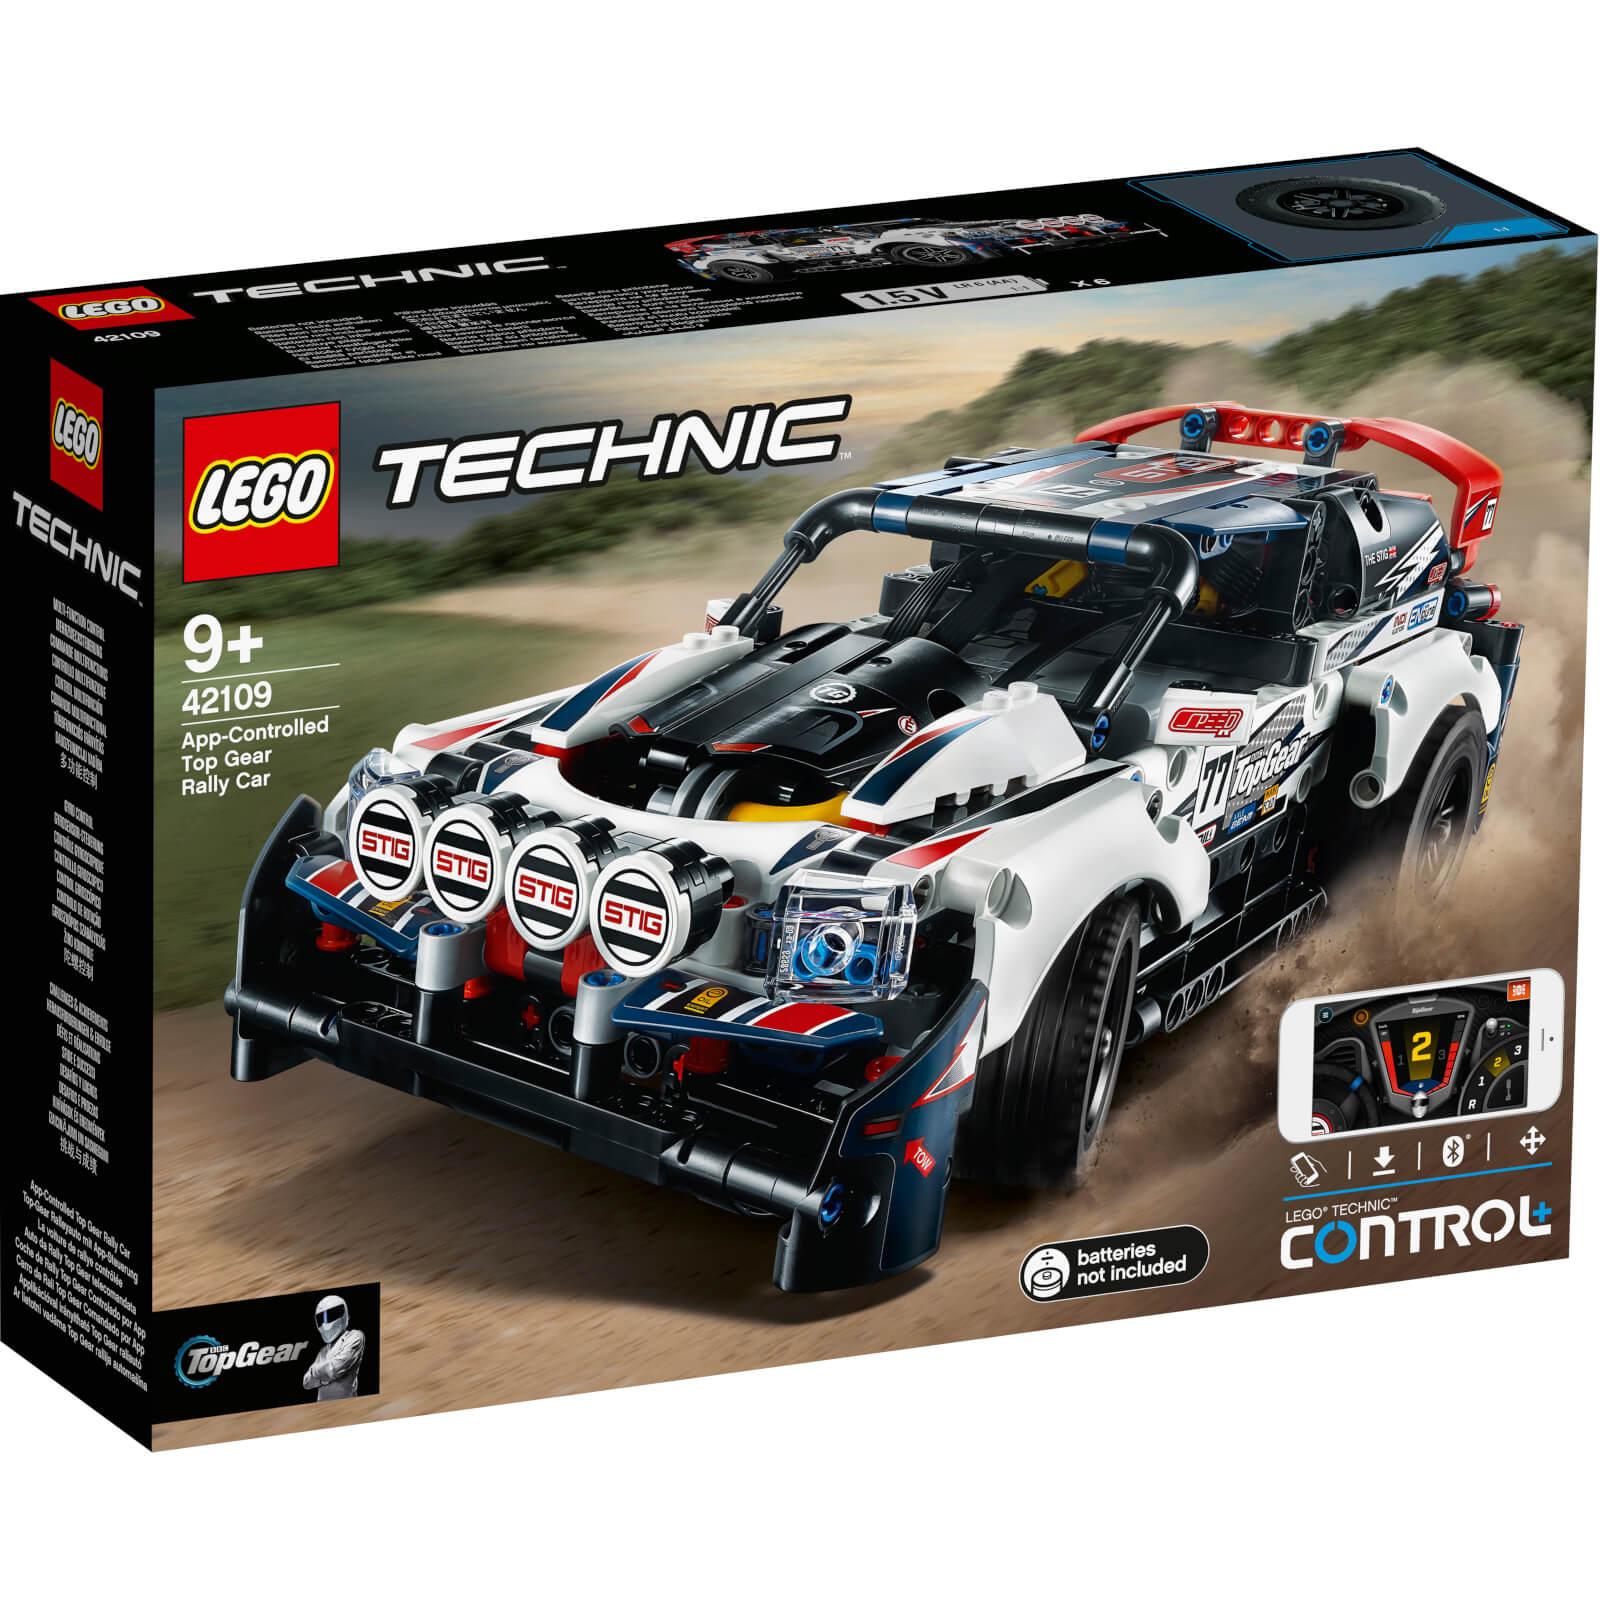 LEGO 樂高 Technic: App 控制 Top Gear Rally Car (42109)